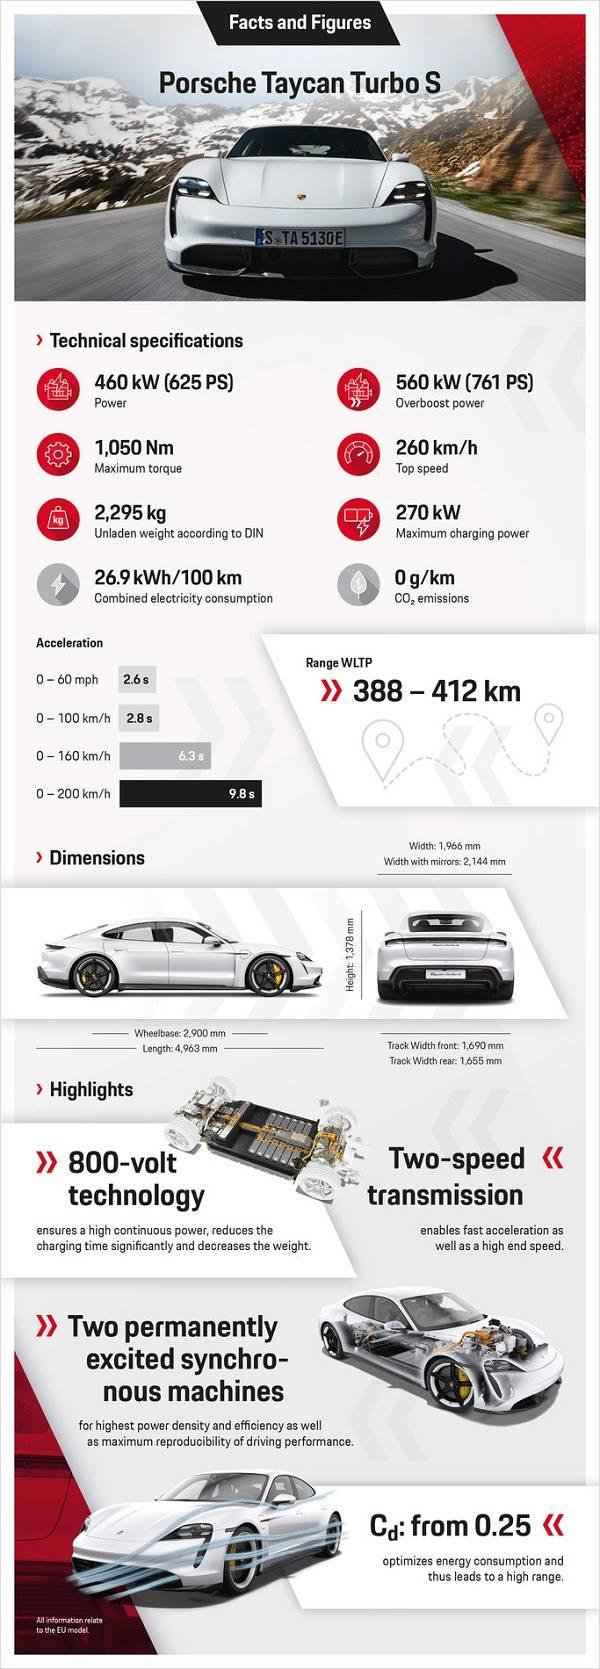 Porsche Taycan - Mewah, Cepat, Tetapi Ramah Lingkungan - Brosur Turbo S A